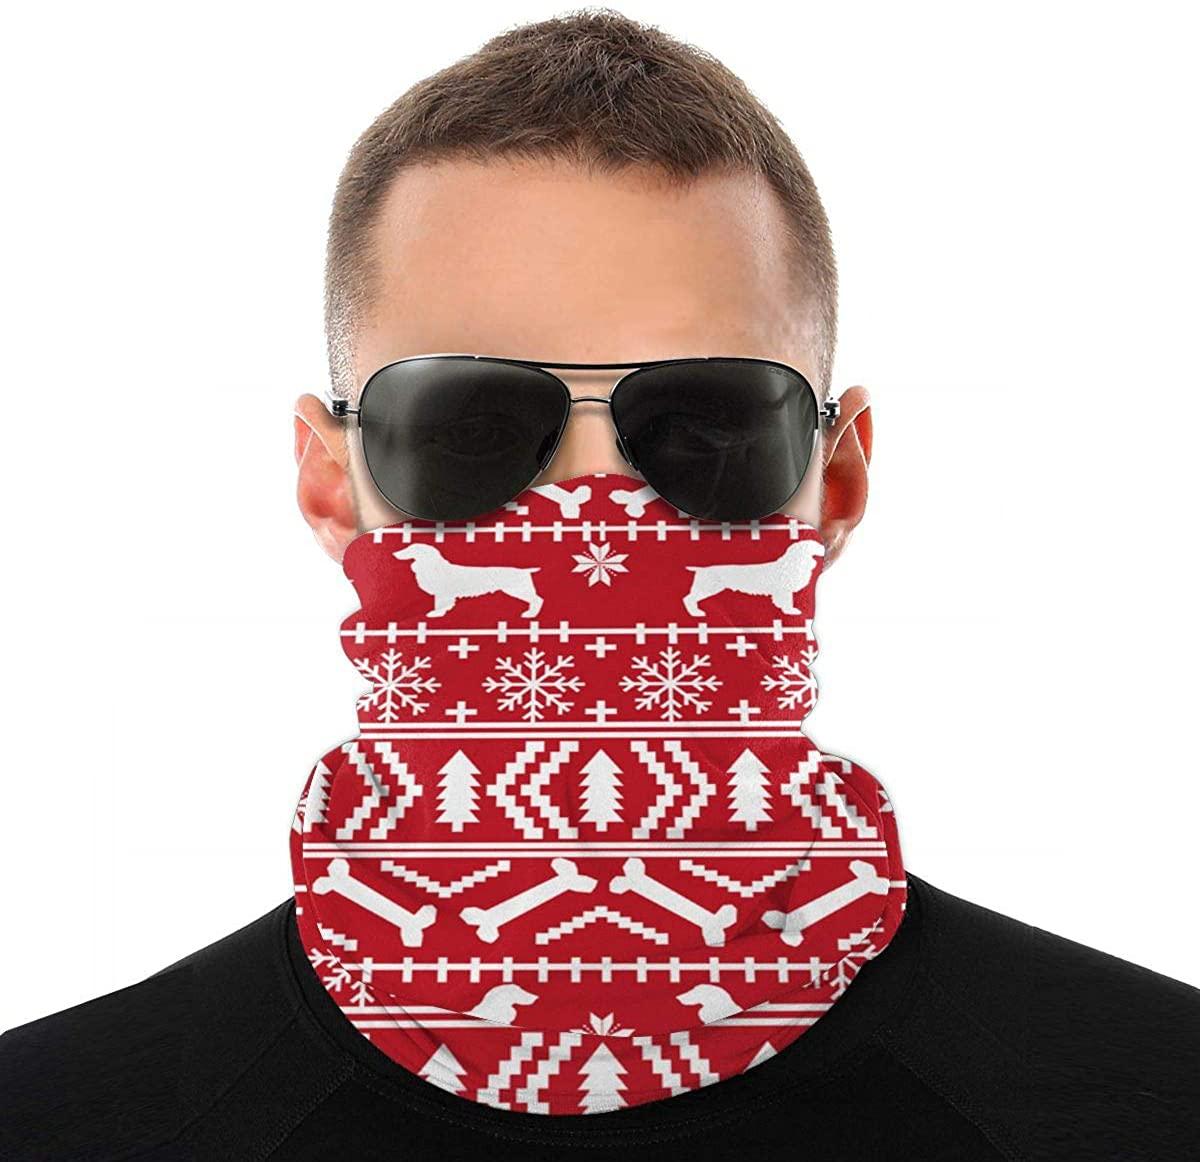 Boykin Variety Head Scarf, Multifunctional Bandanas & Balaclava Anti Dust for Outdoors, Festivals, Sports